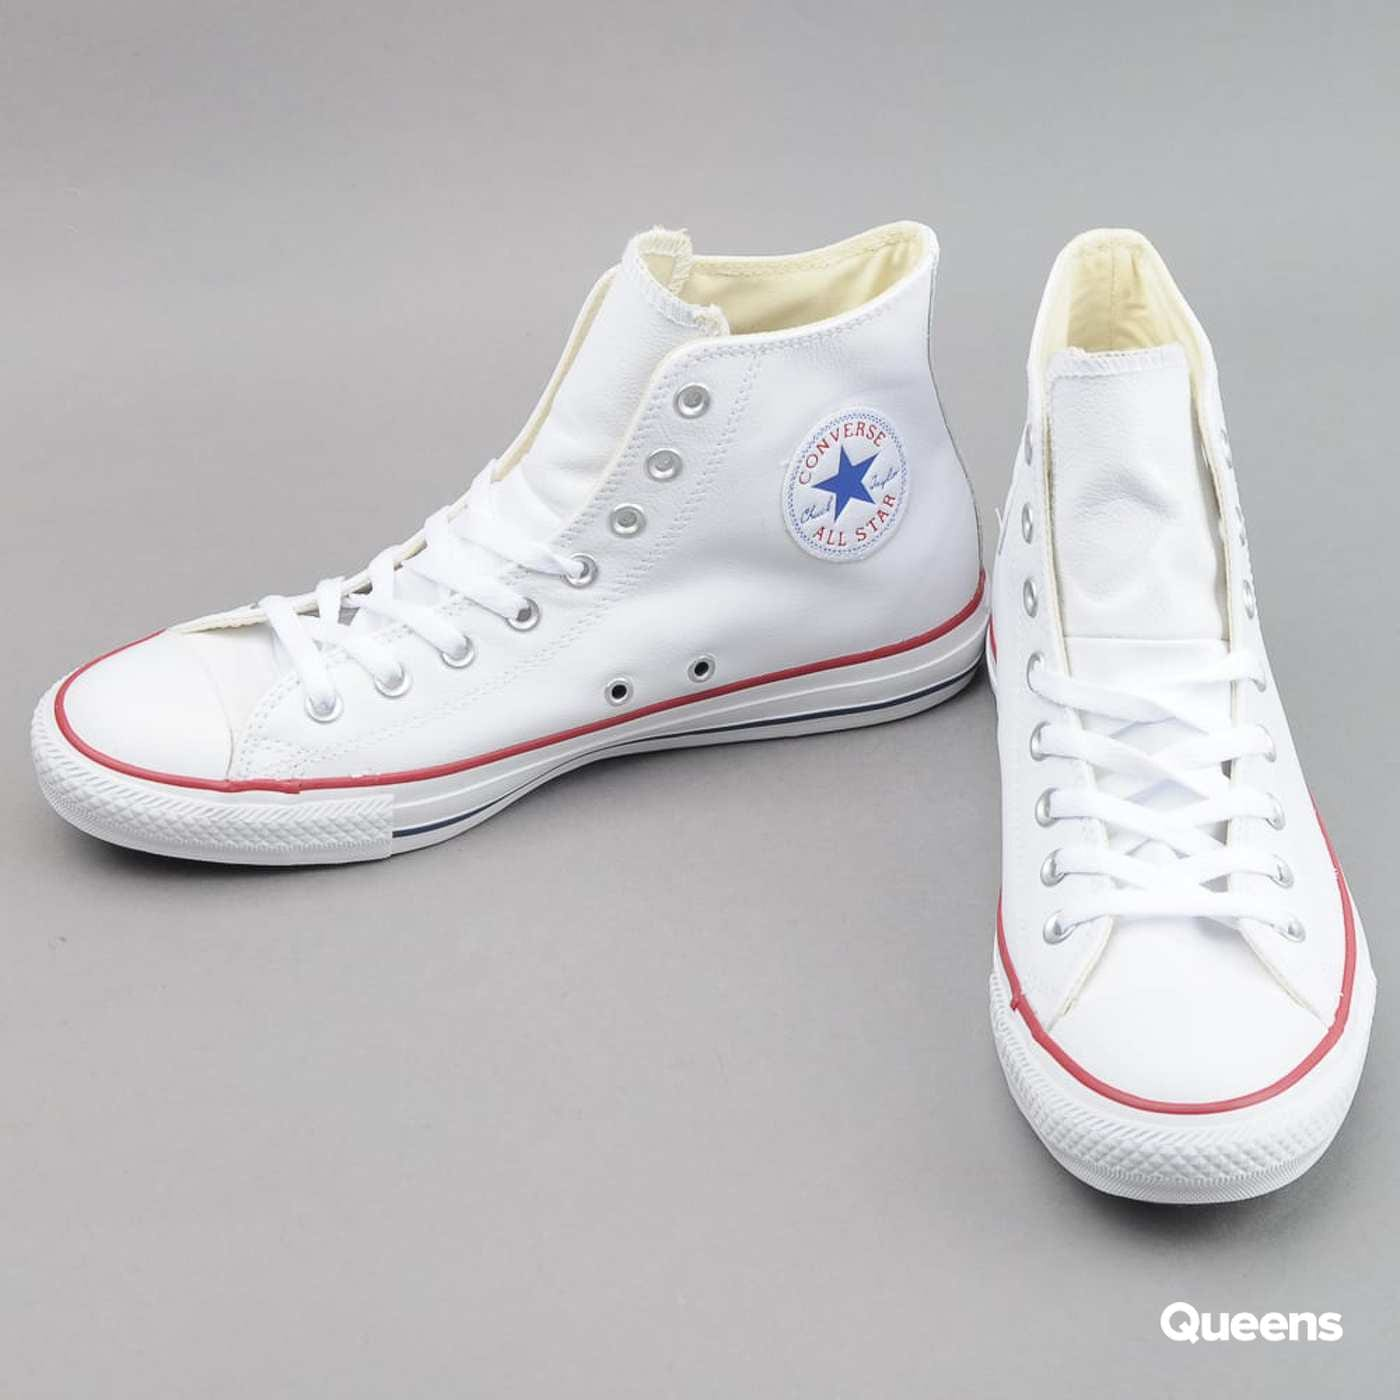 Converse Chuck Taylor All Star Hi white